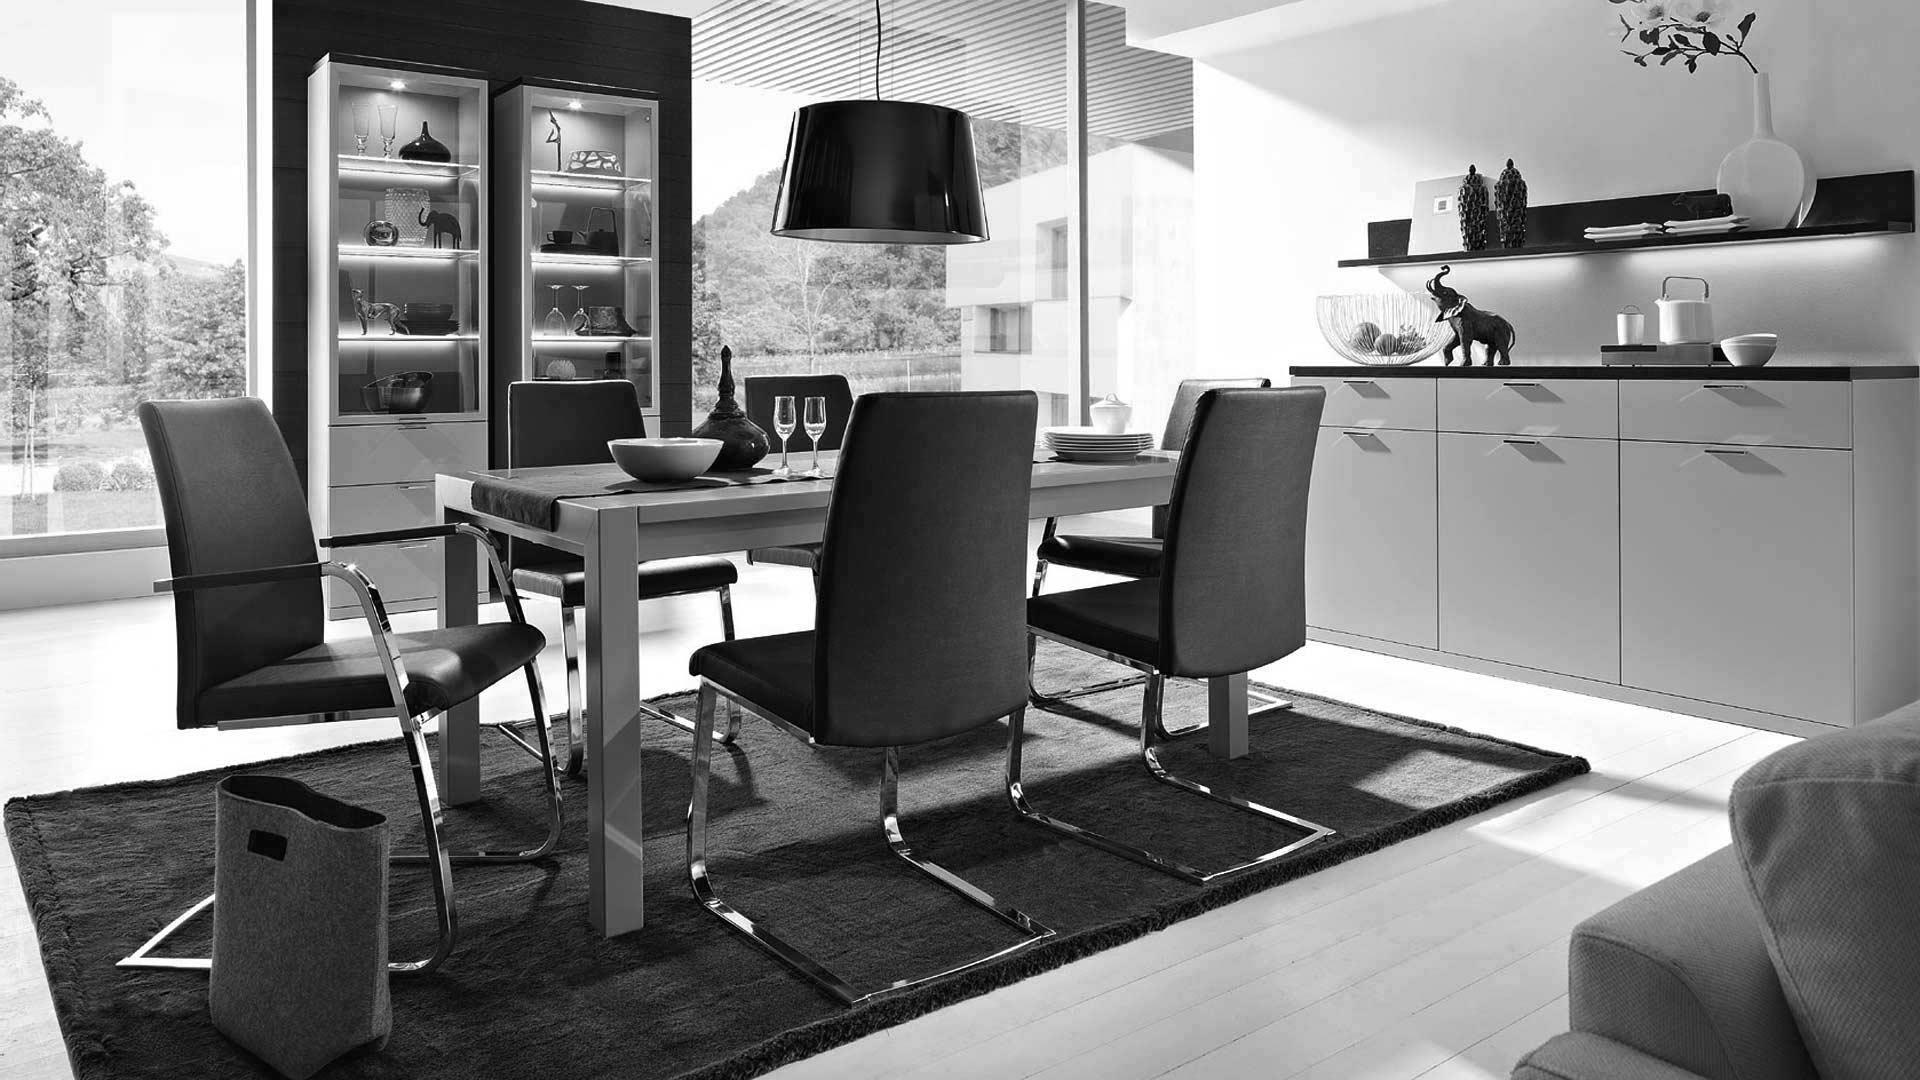 Möbelhäuser Kassel speisezimmer europa möbel vellmar nahe kassel möbel bolte